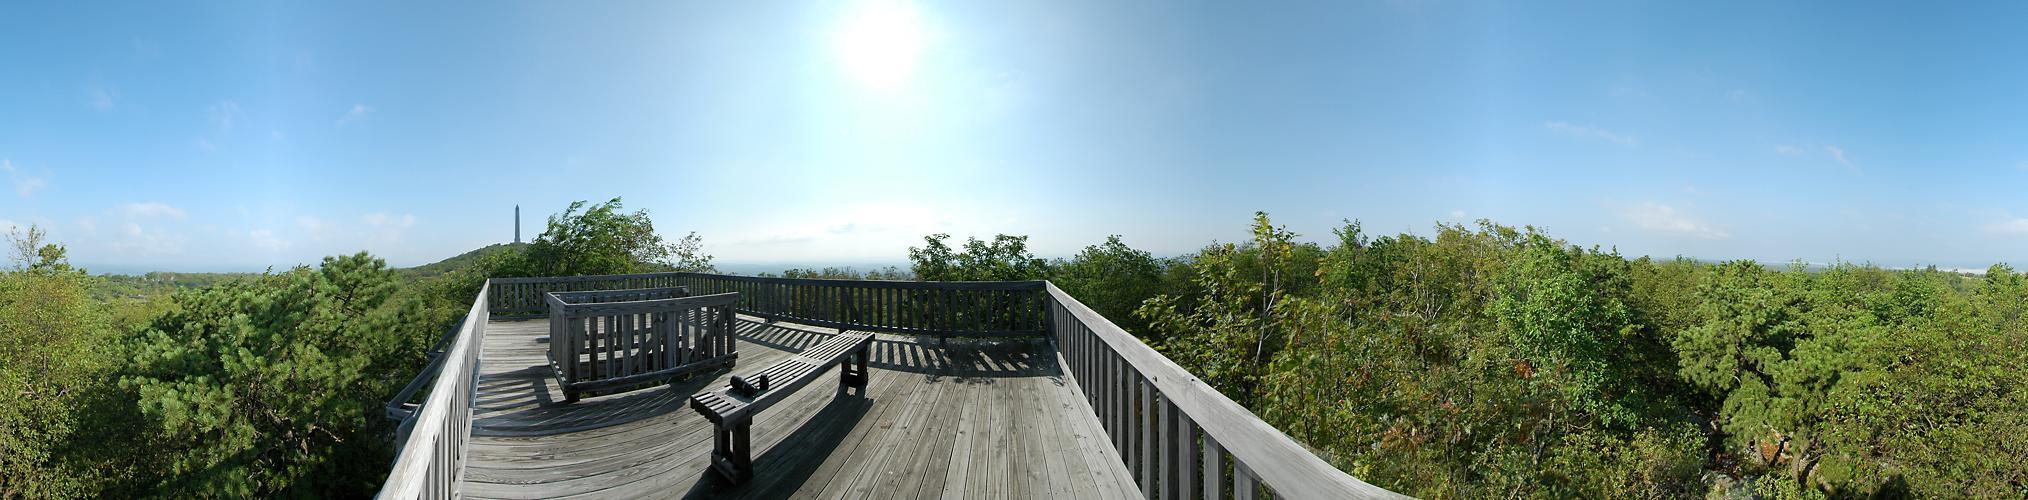 High Point, Panoramic, Pano_1